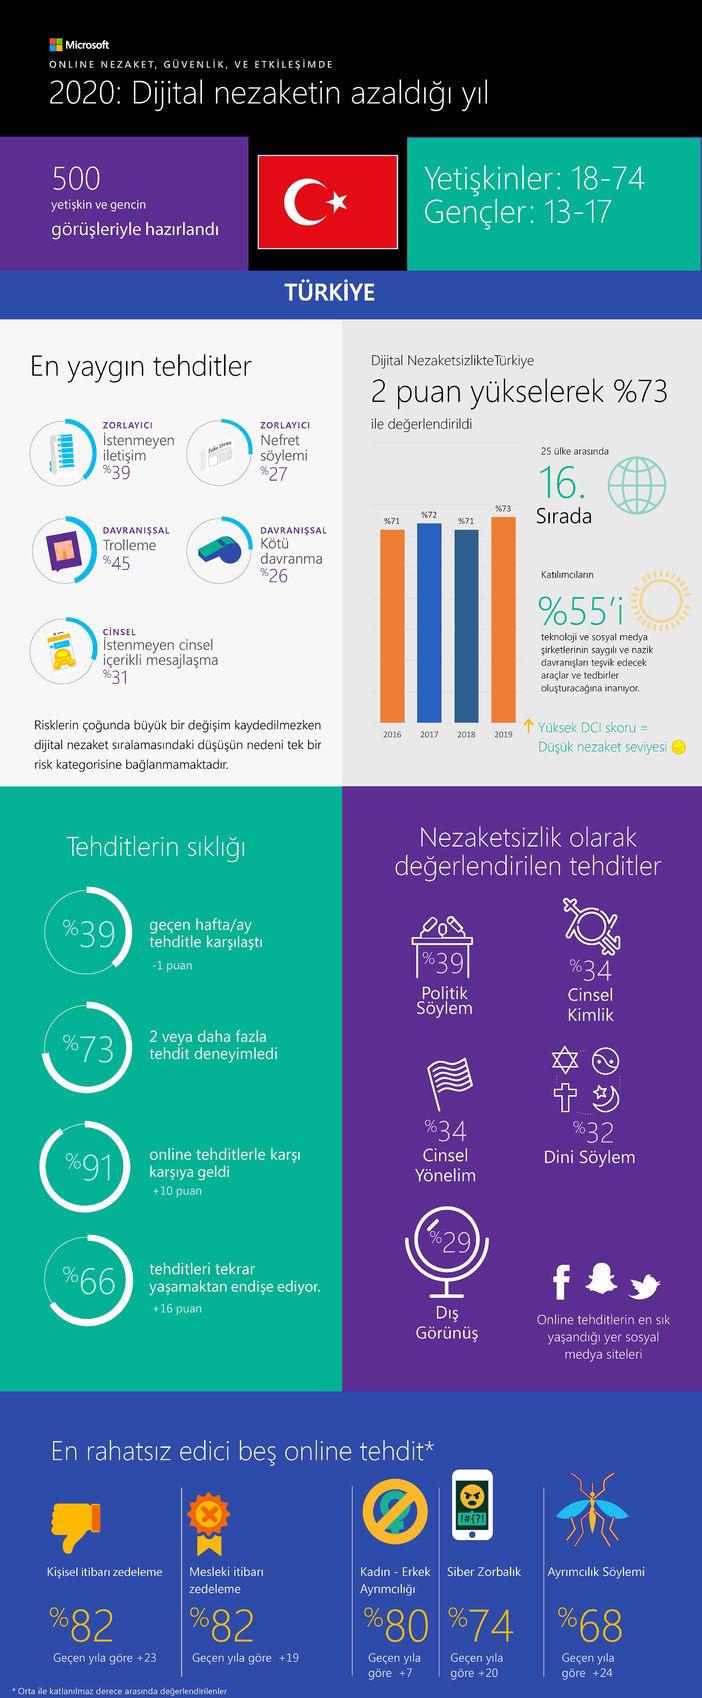 Dijital Nezaket 2020 - İnfografik